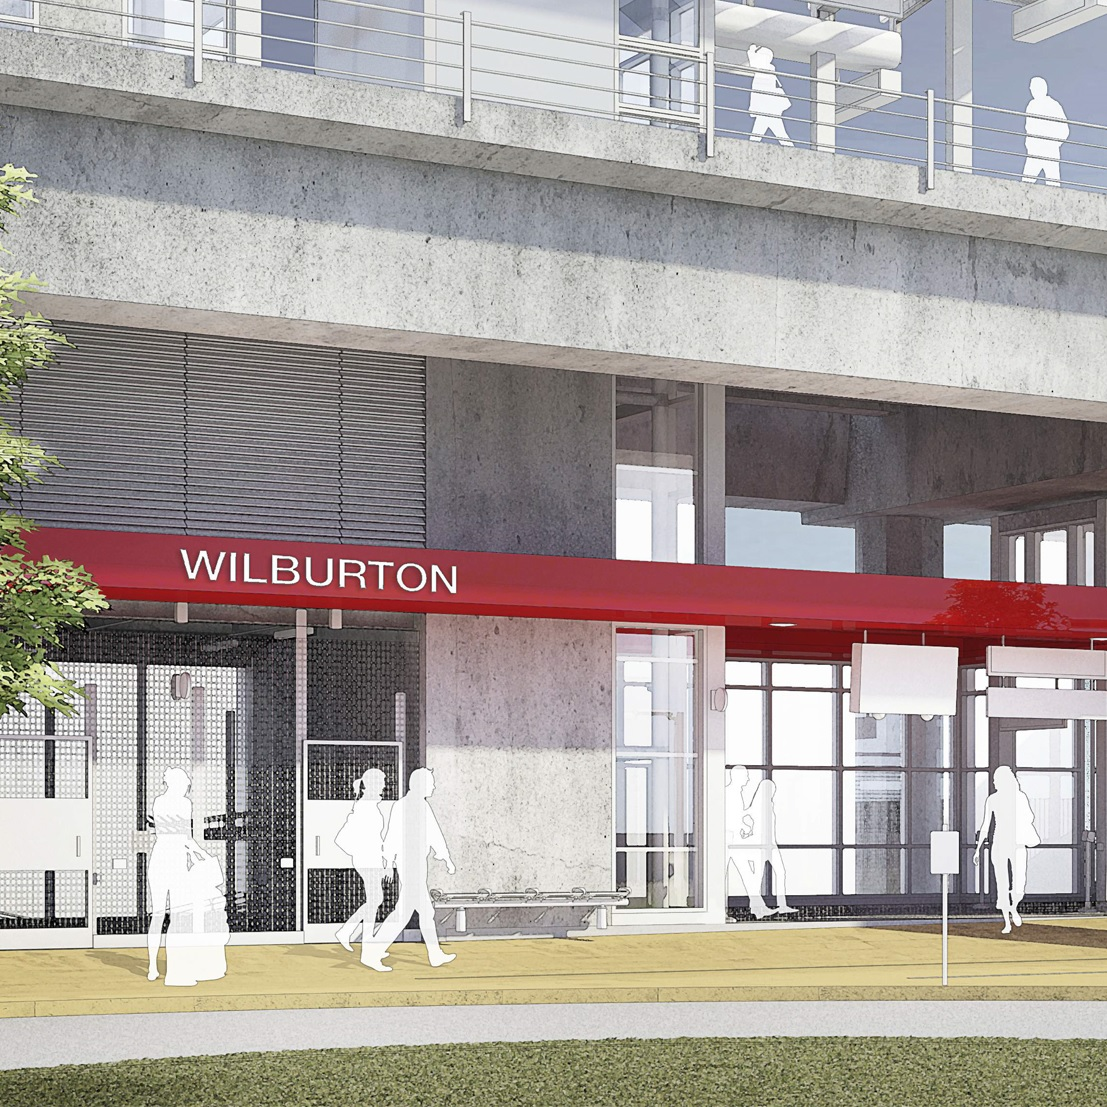 East Link Wilburton Station